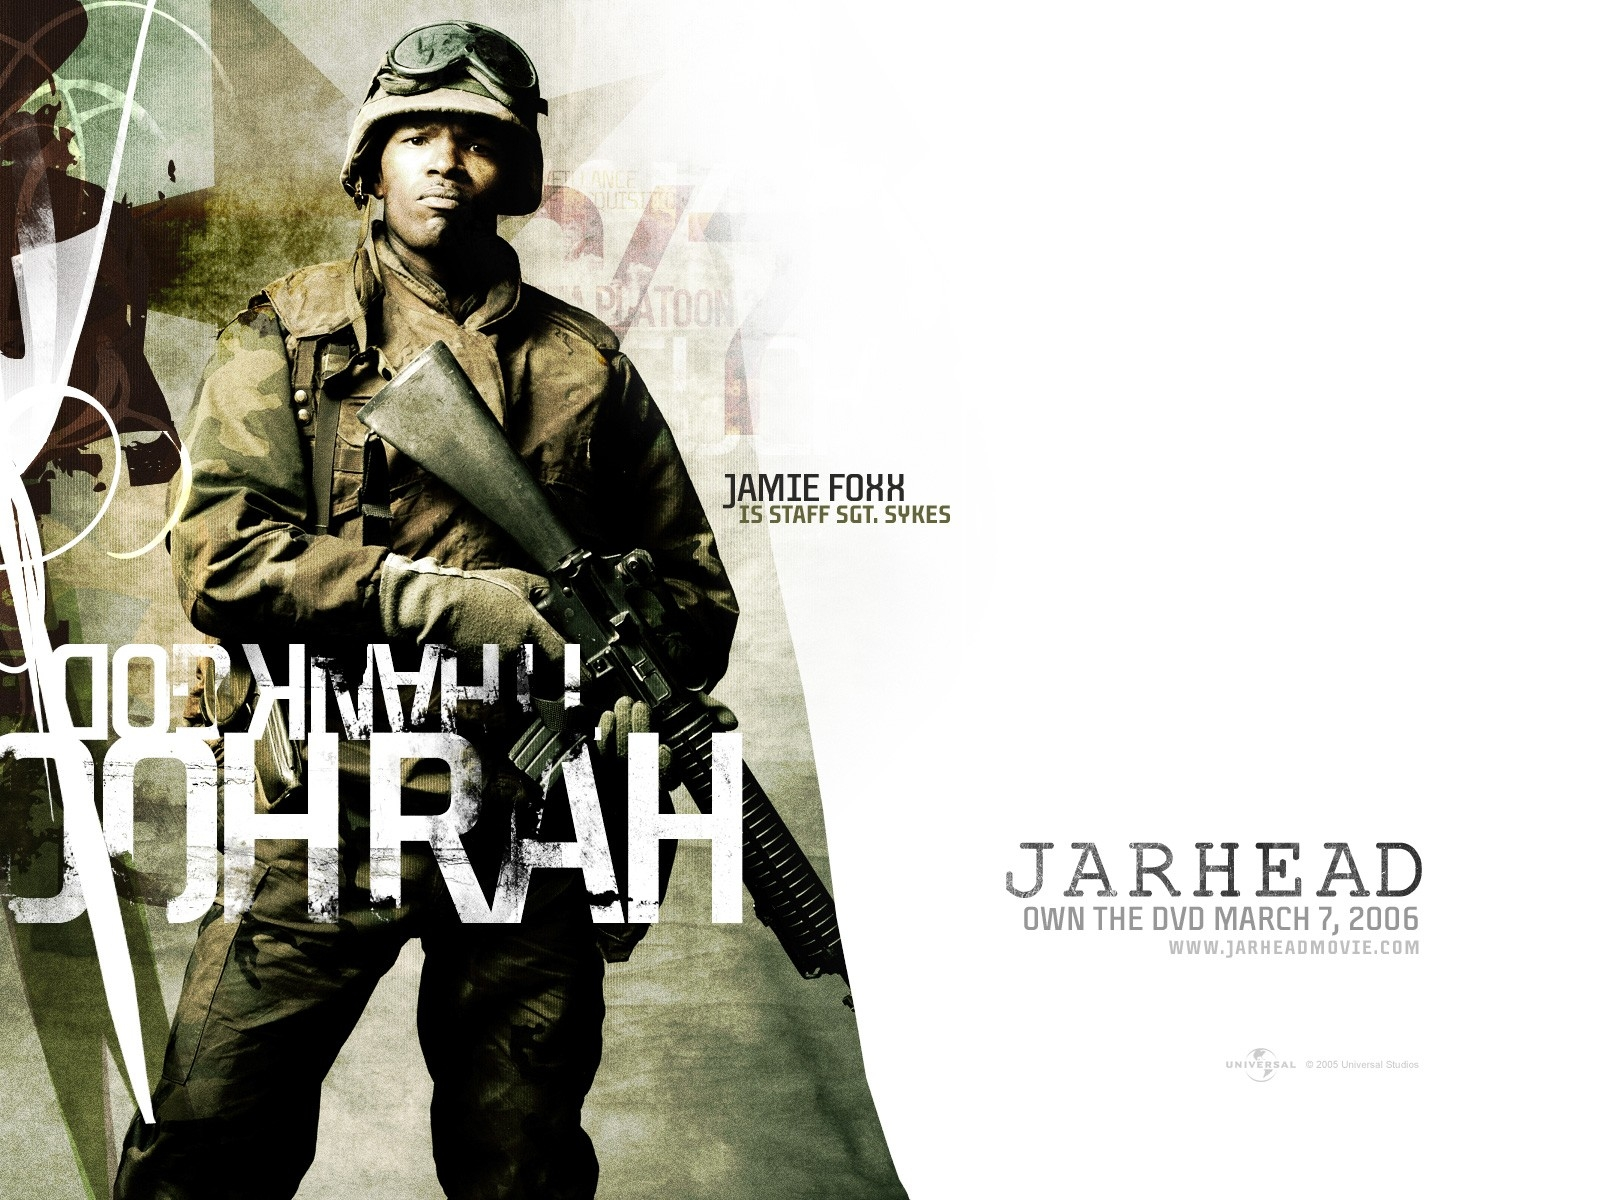 Wallpaper del film Jarhead con Jamie Foxx